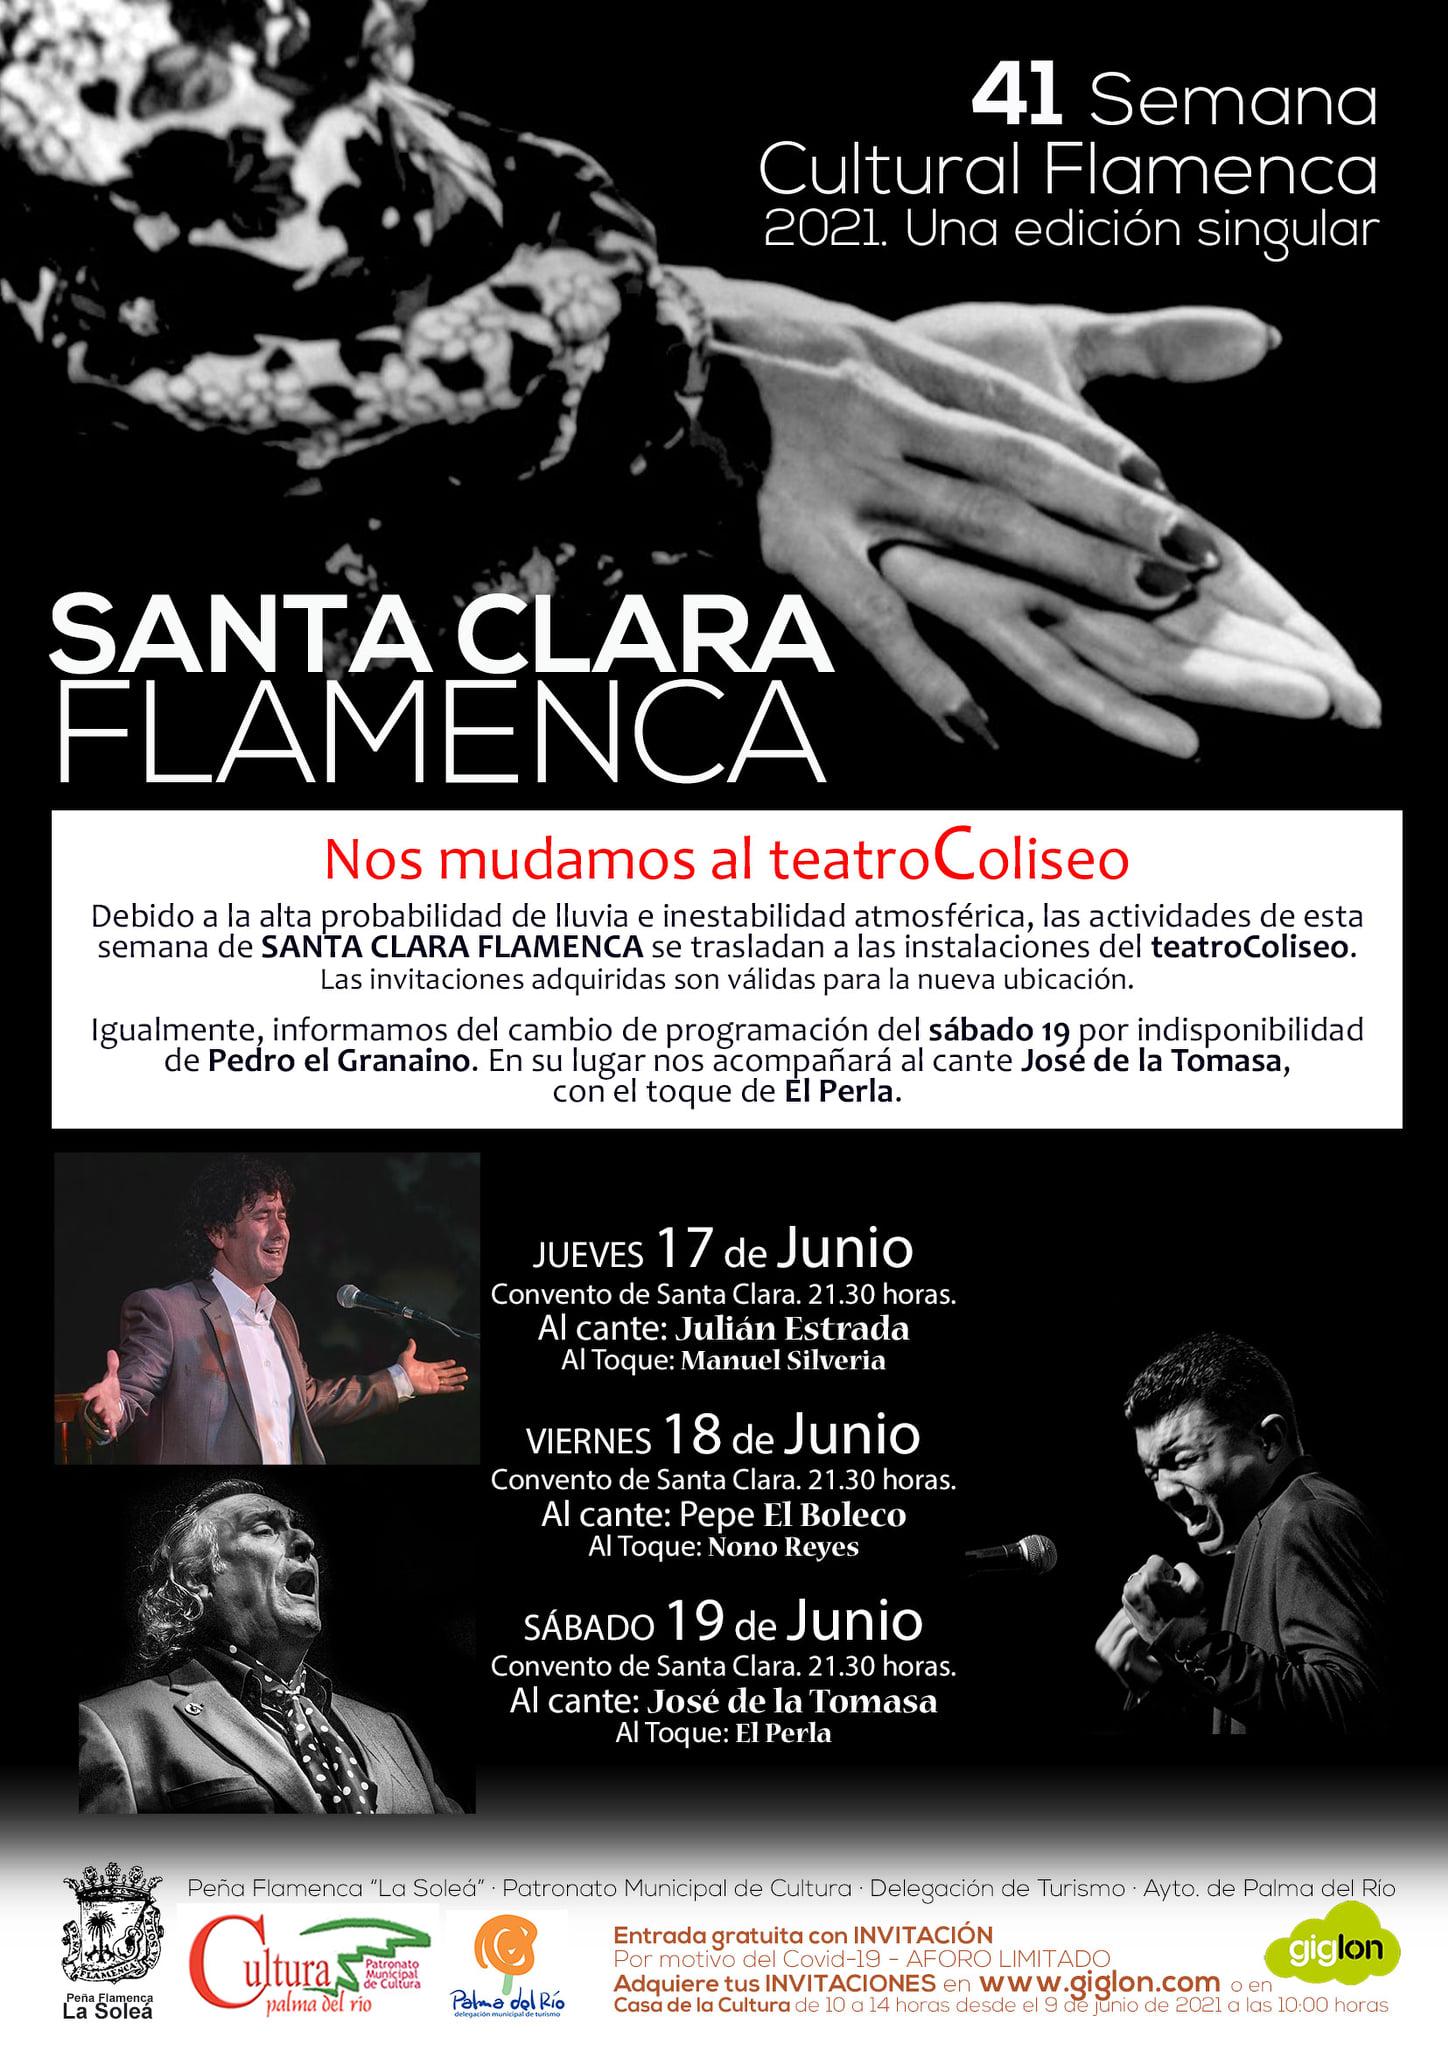 https://www.palmadelrio.es/sites/default/files/cambio_semana_flamenca_2021.jpg